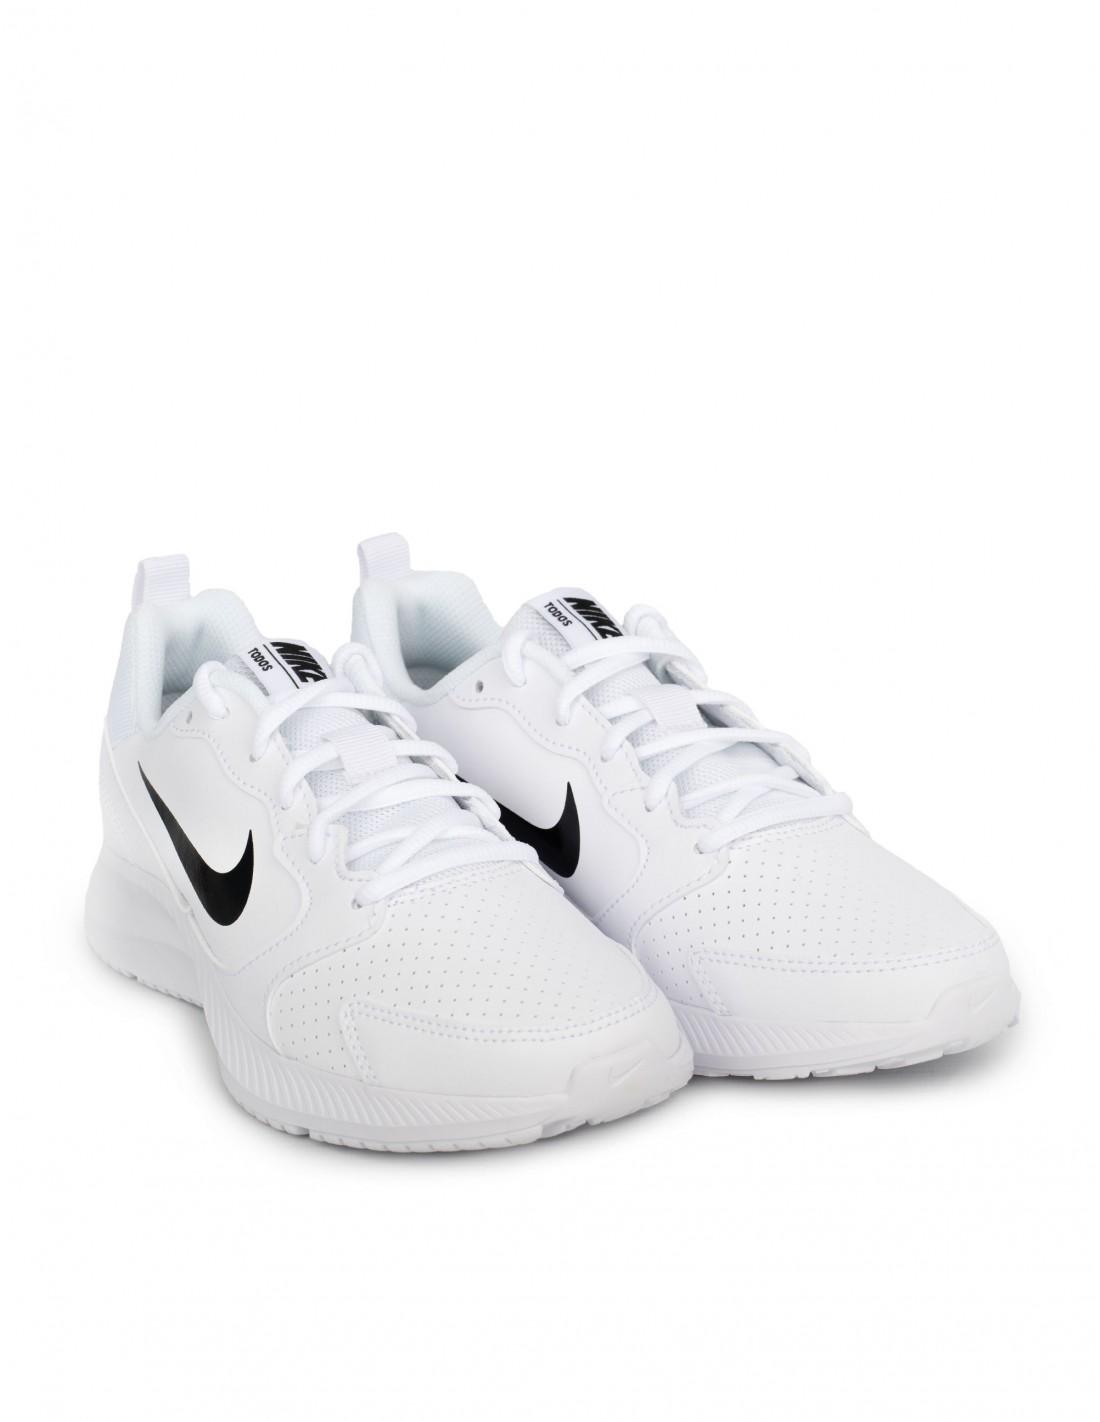 Zapatillas Nike Mujer Todos Blanco PERA LIMONERA